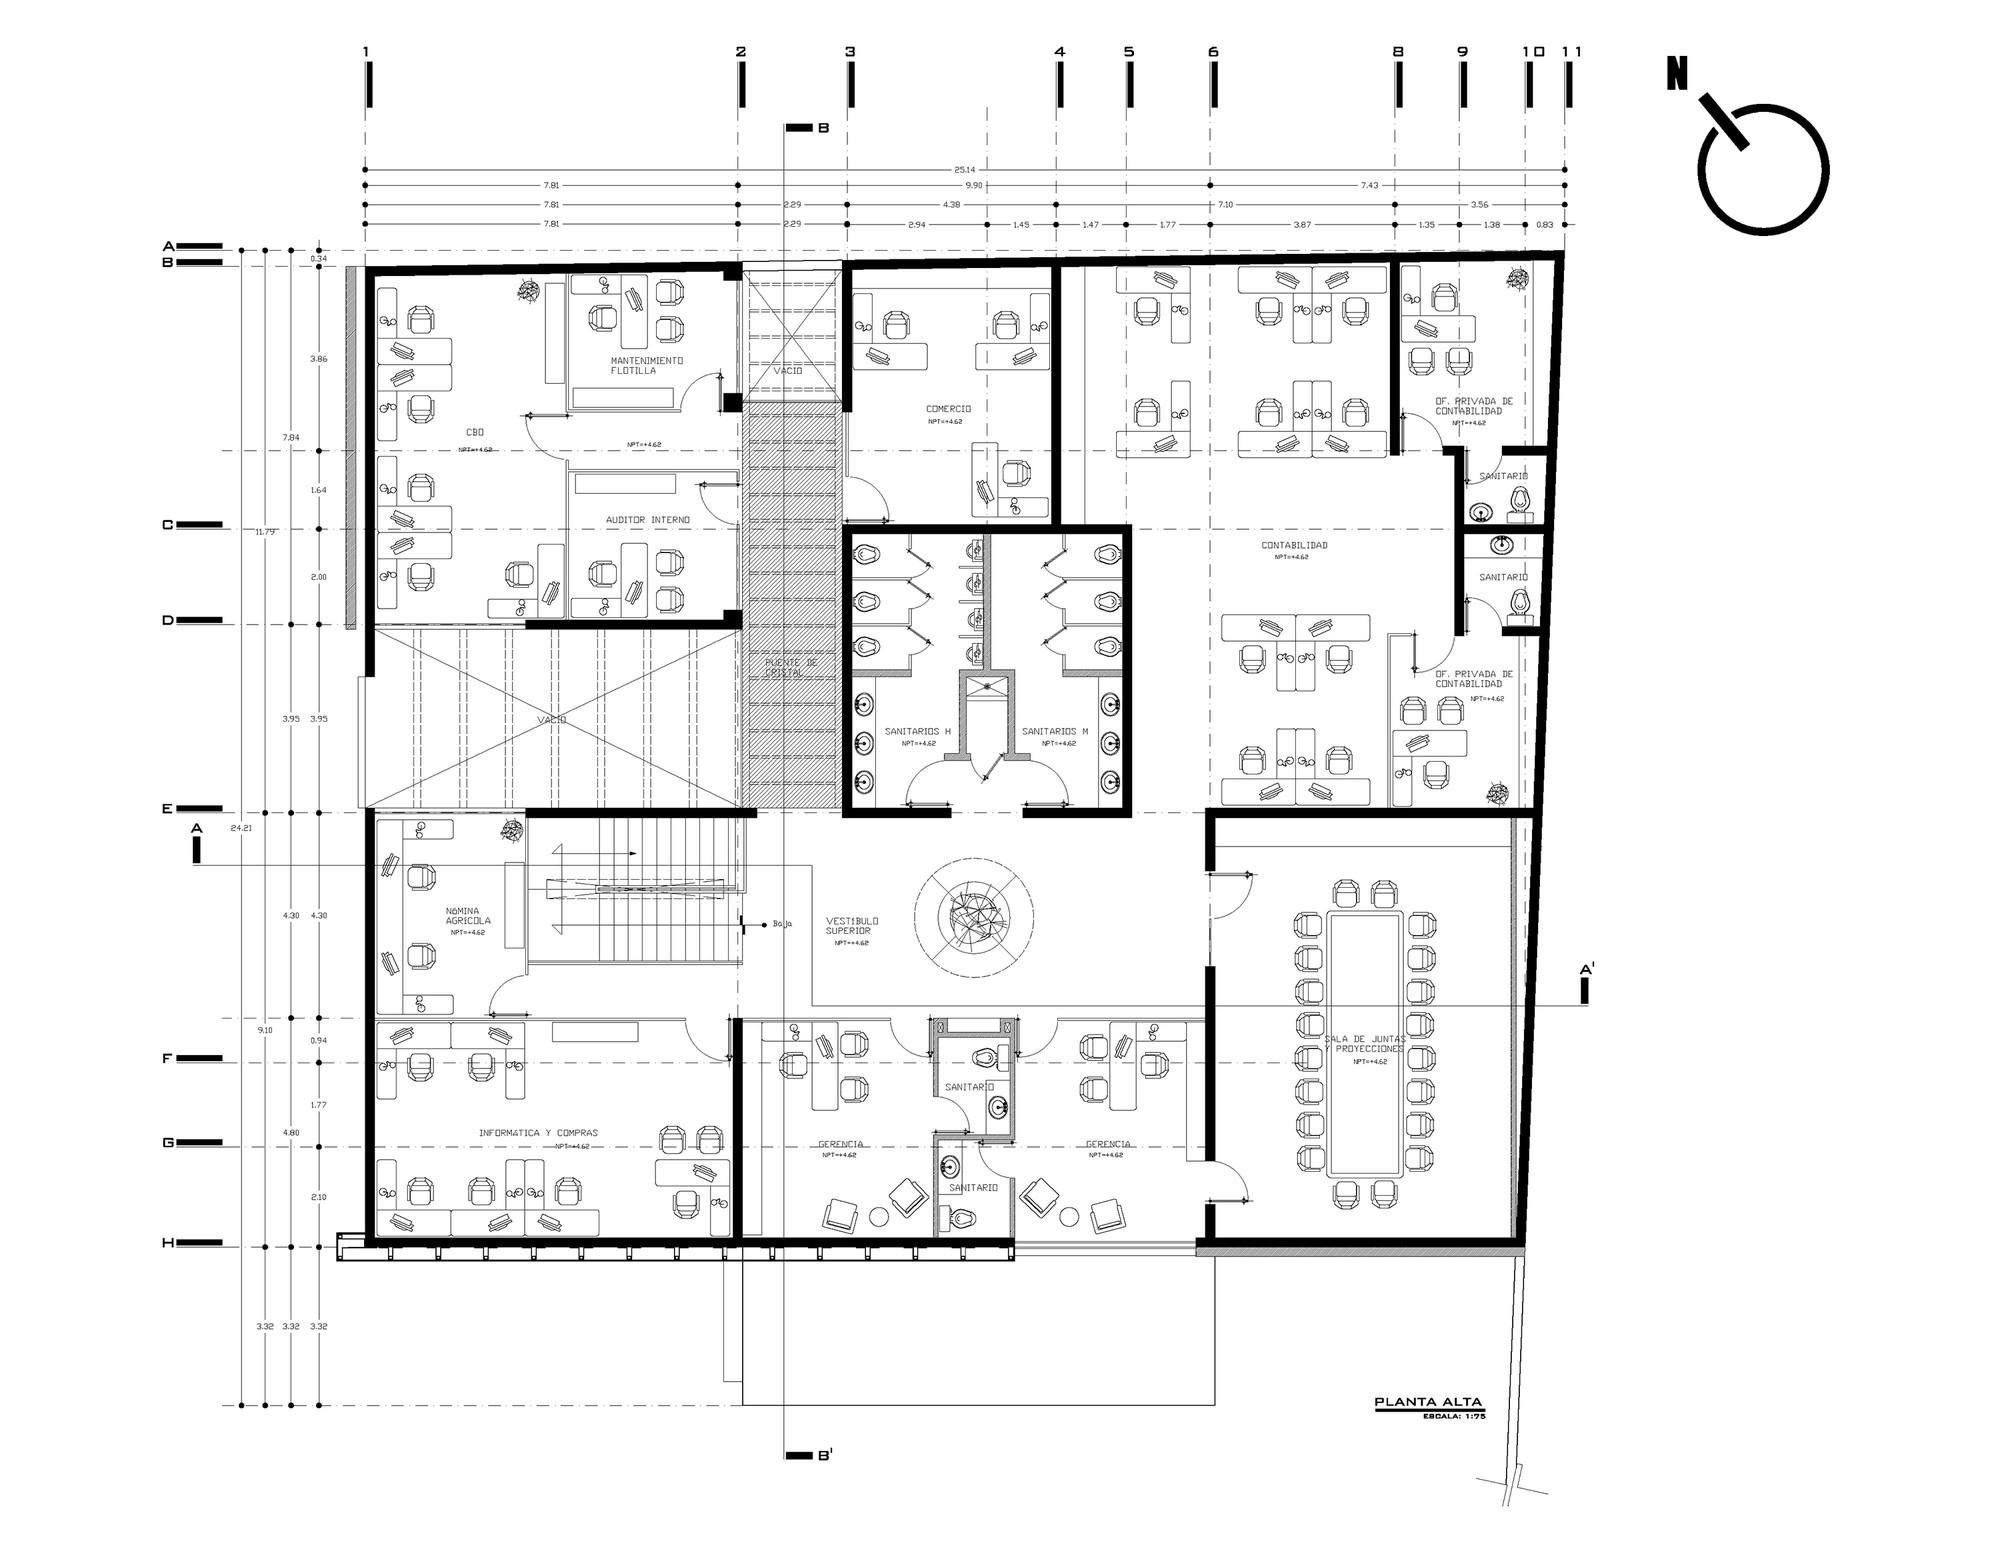 Galer a de corporativo sun belle berries alfa studio for Plantas de oficinas arquitectura